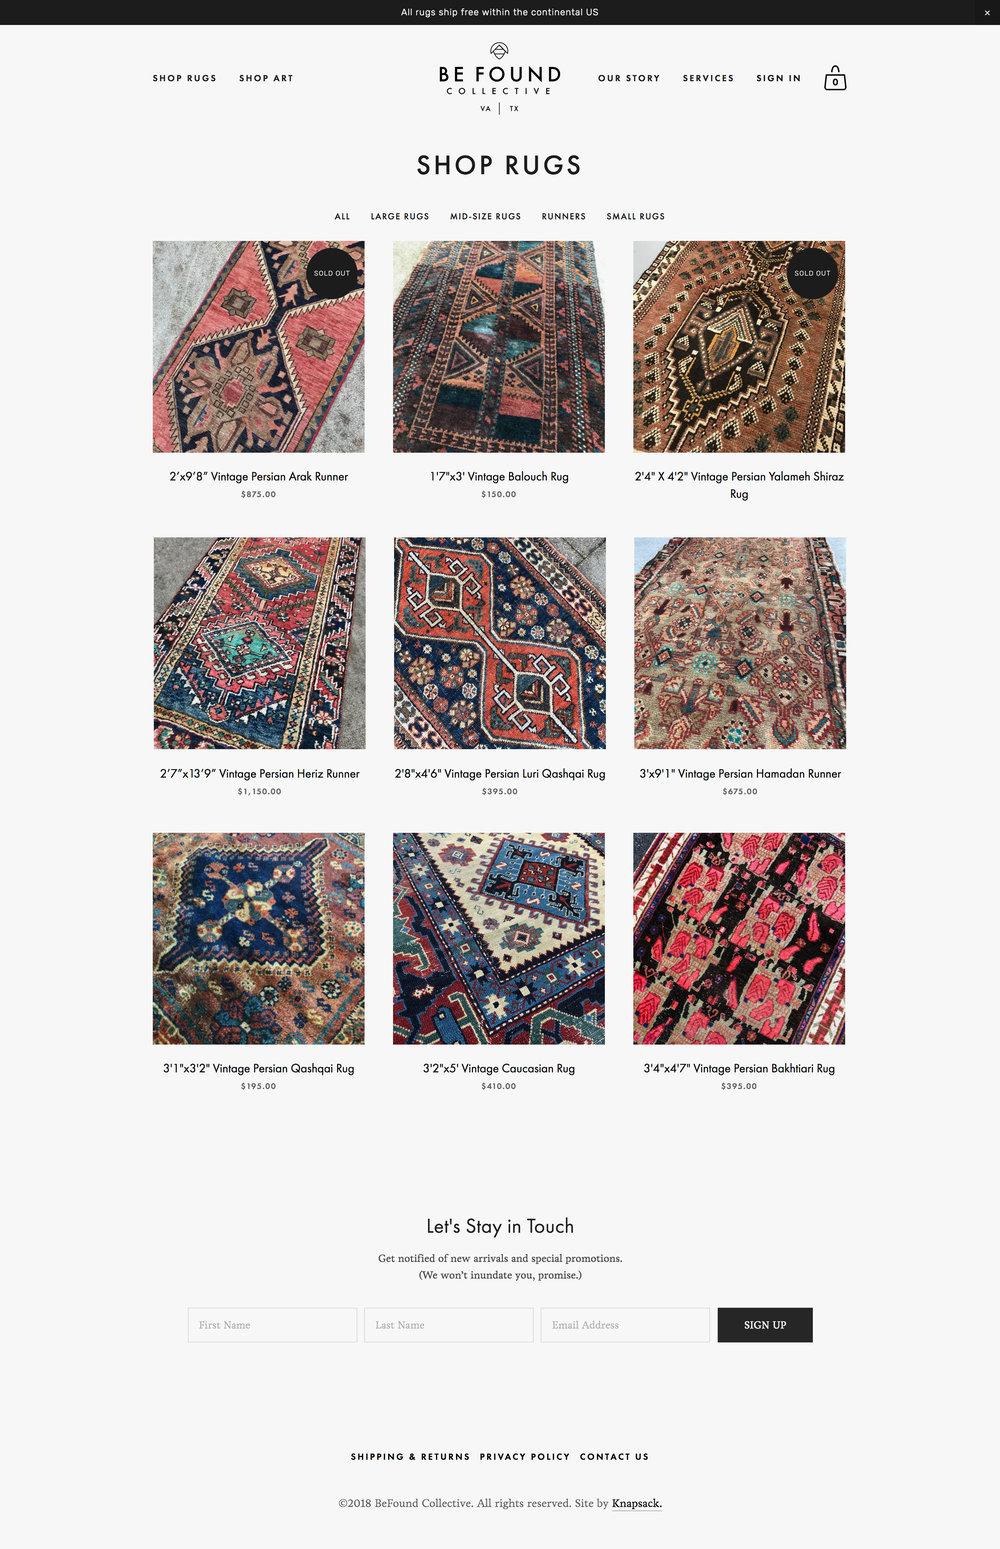 BeFound-Collective-Shop-Art-Macbook-Overlay.jpg